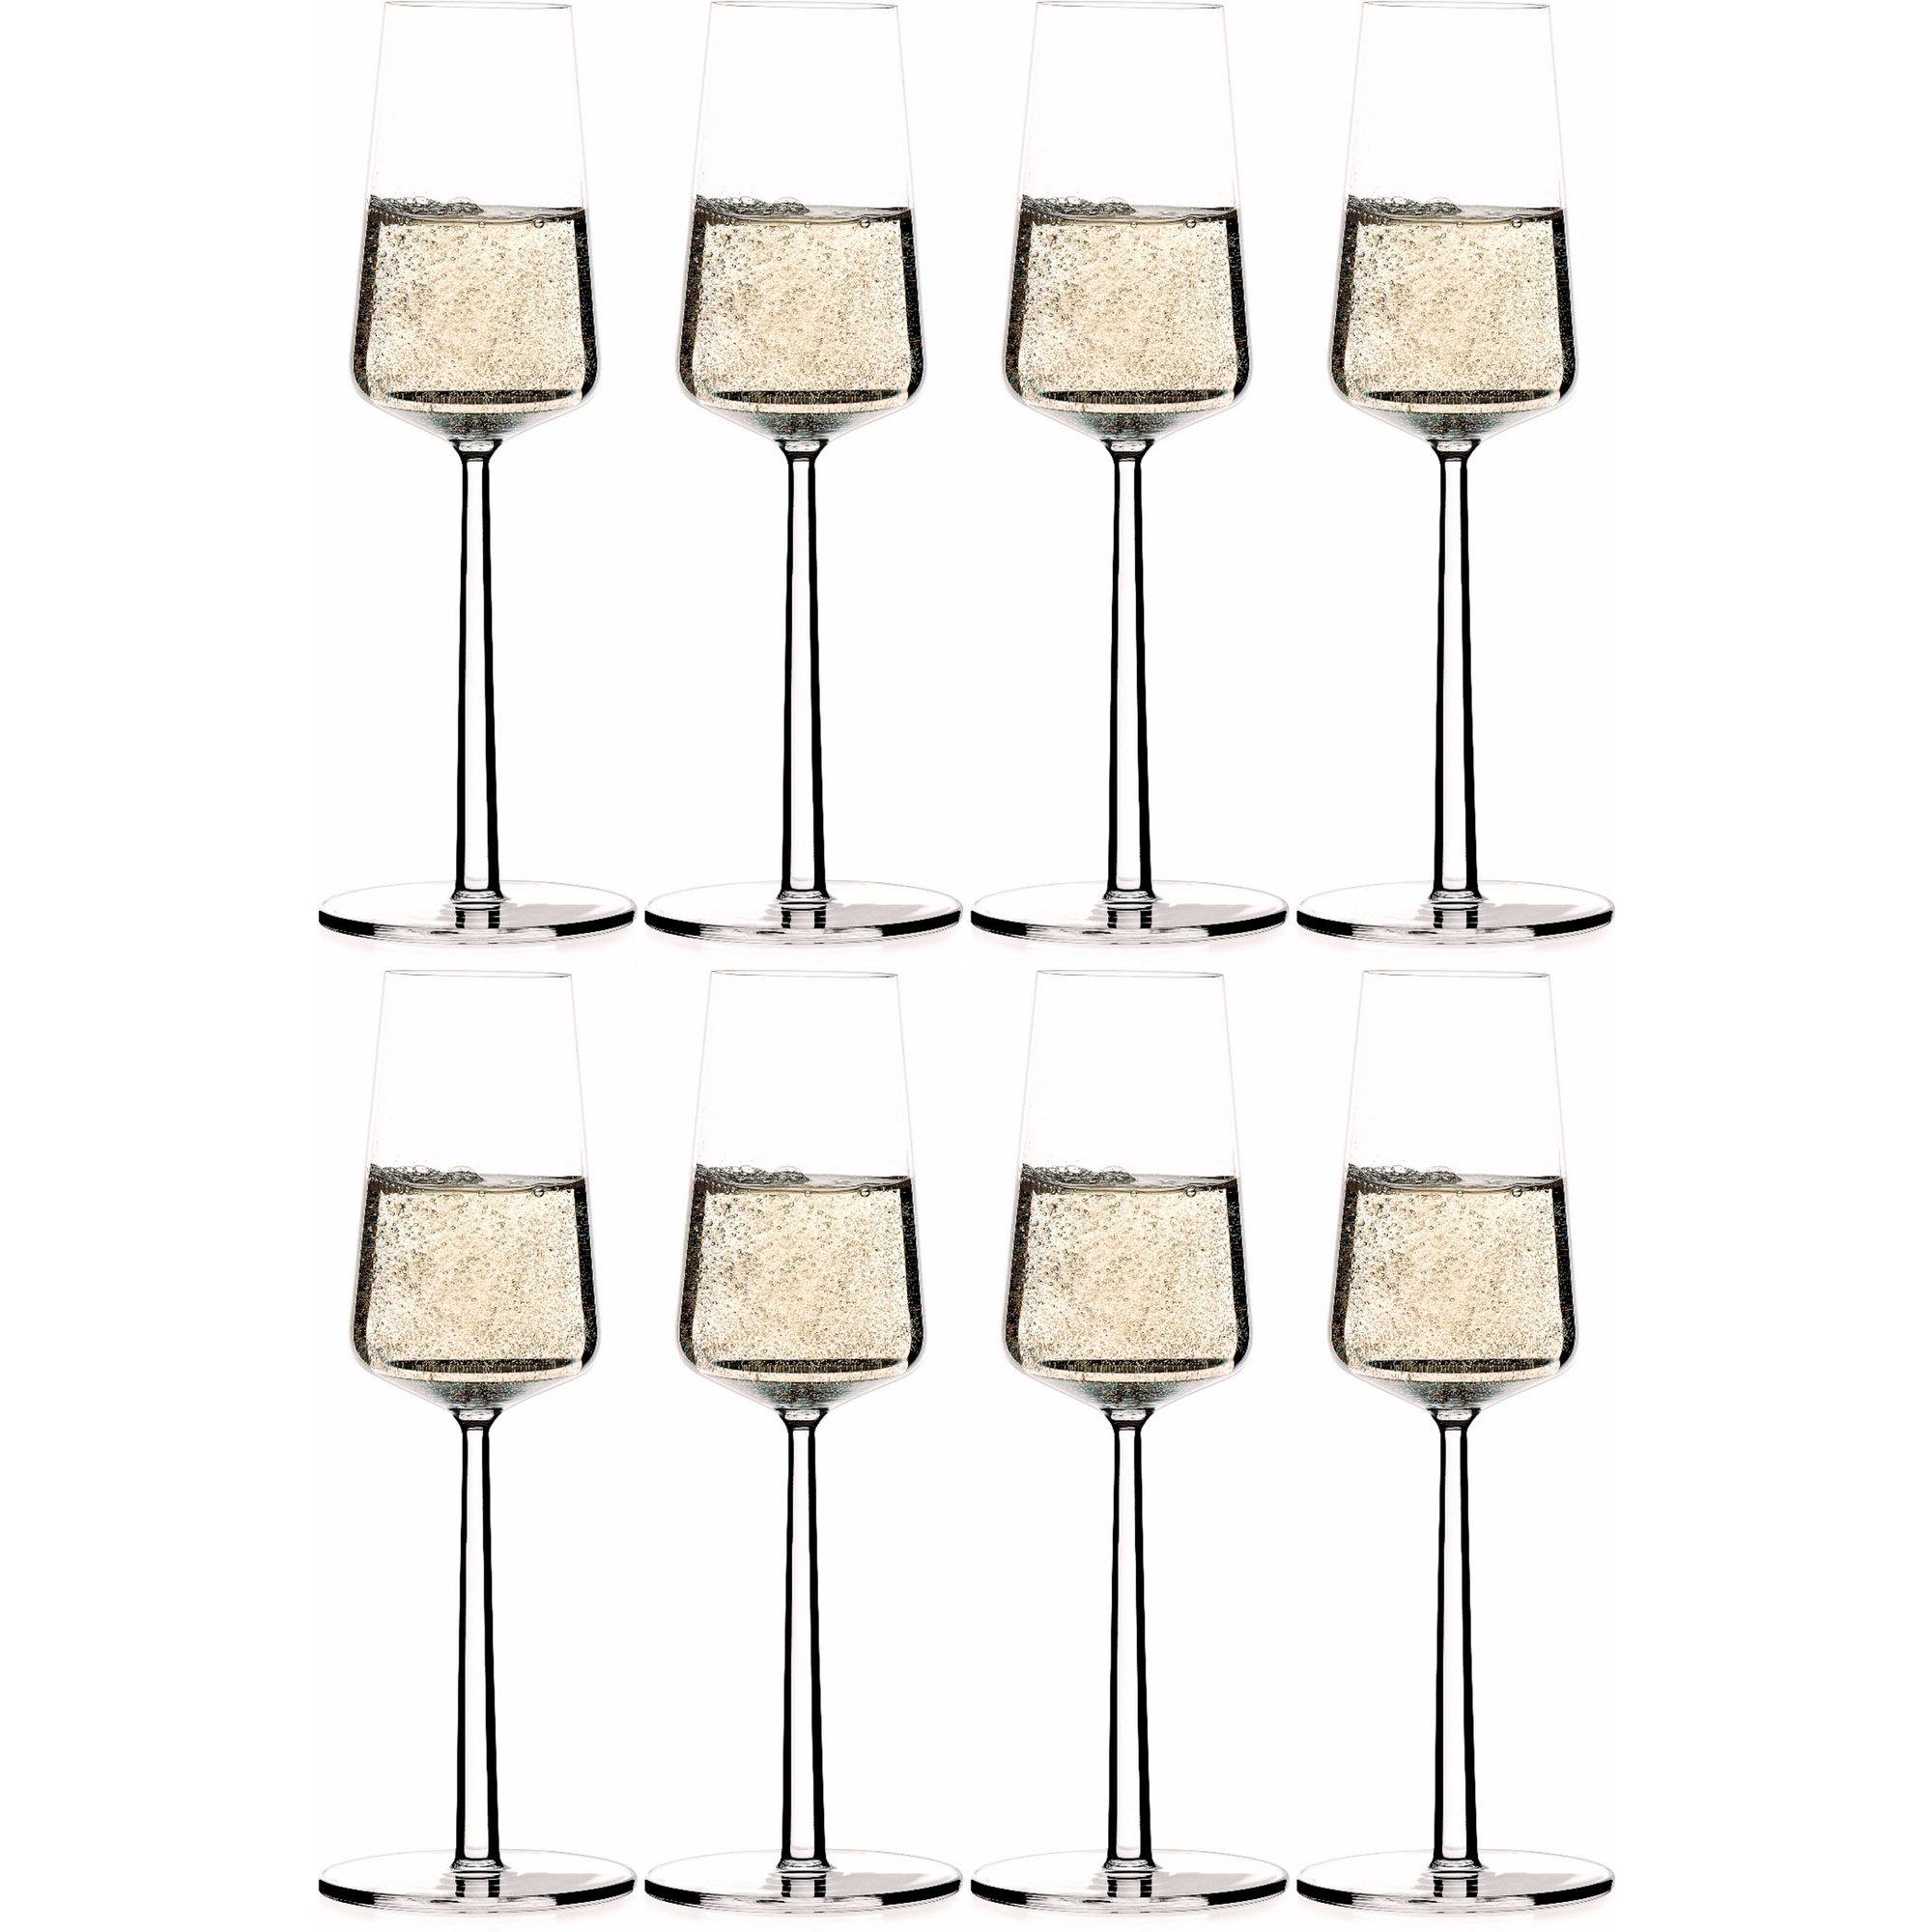 Iittala Essence champagneglas 21 cl. 8 st.